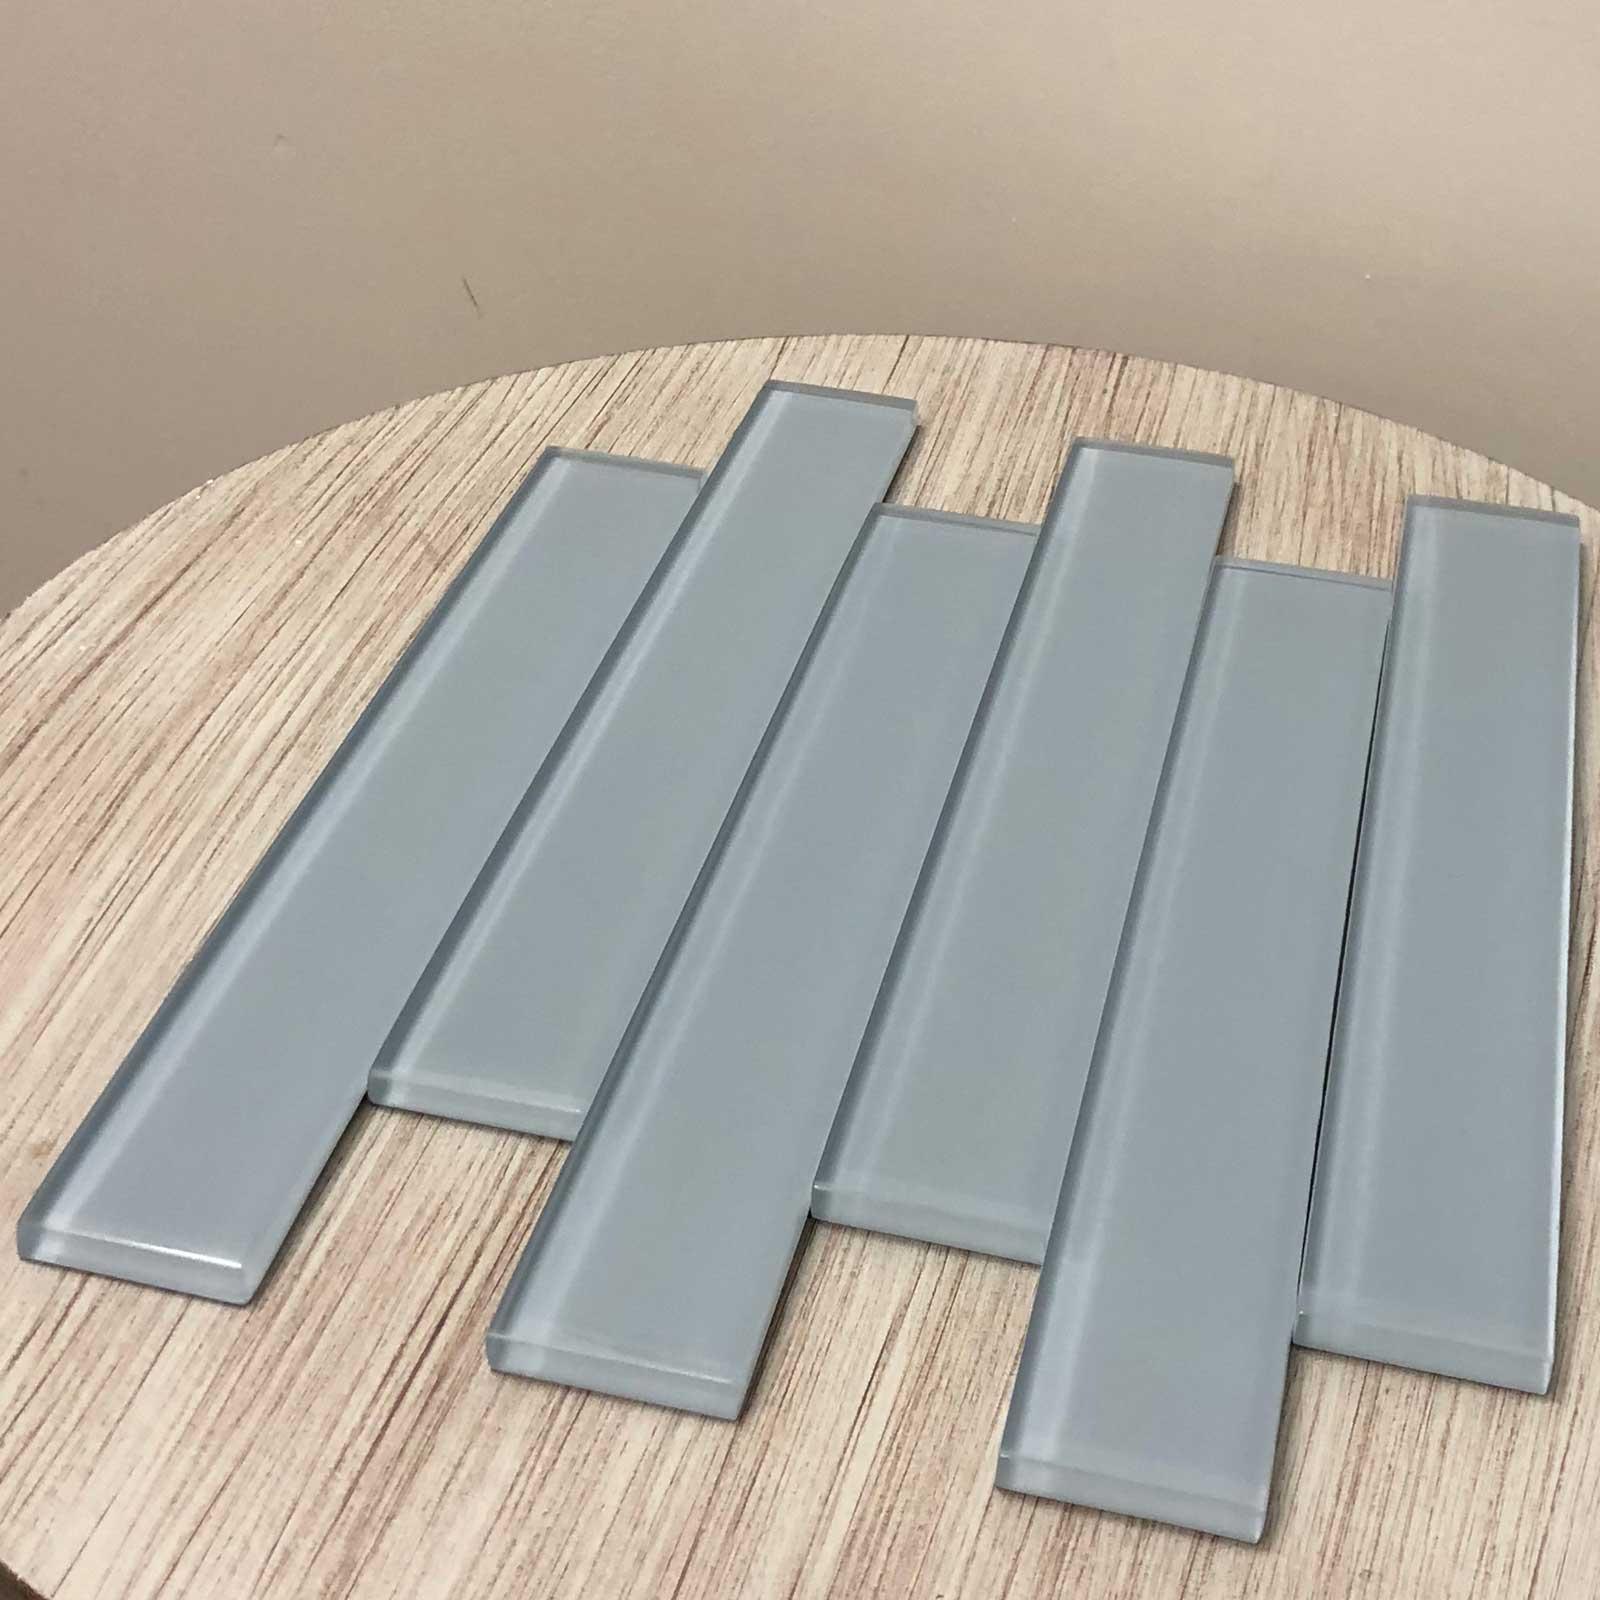 Pewter Glass Tile 2 x 12 Polished